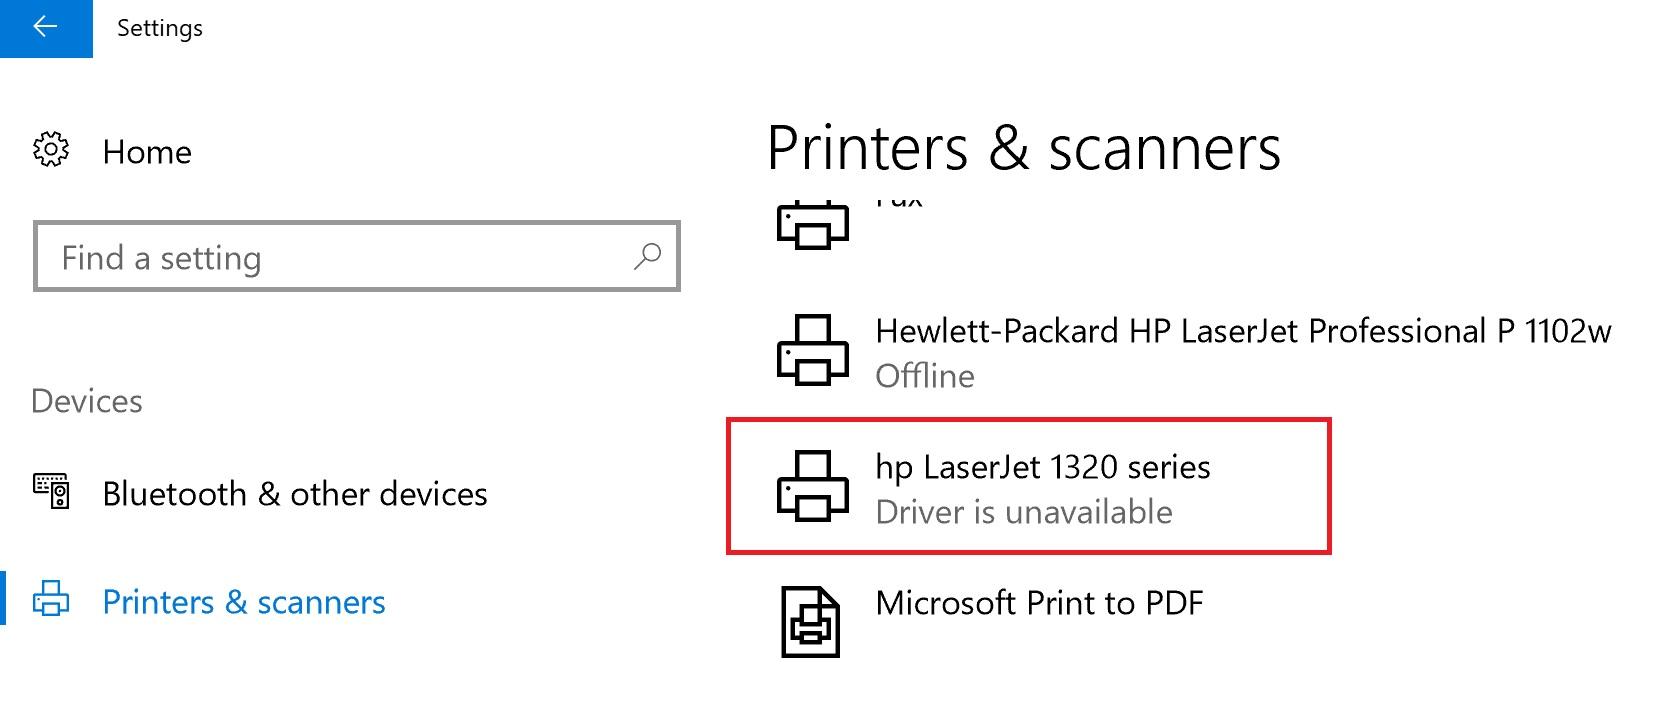 microsoft driver update for hp laserjet 1320 pcl 5 error rh answers microsoft com hp 1320 manual feed press enter HP 1320 Printer Warning Lights